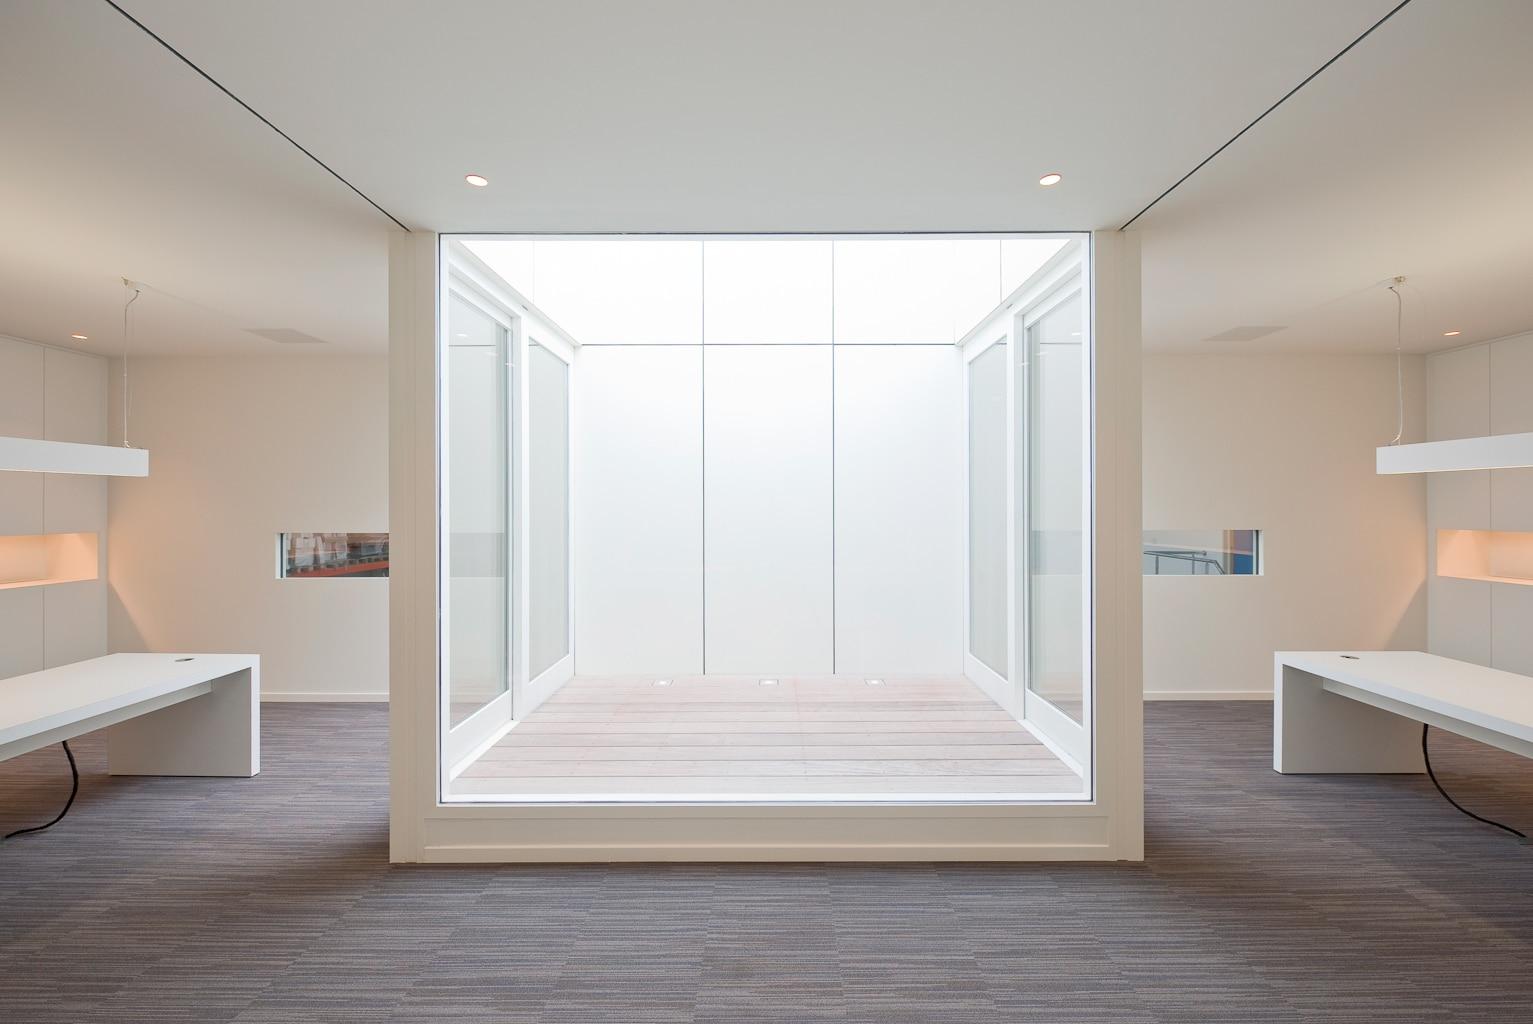 LRP5238web | Baeyens & Beck architecten Gent | architect nieuwbouw renovatie interieur | high end | architectenbureau